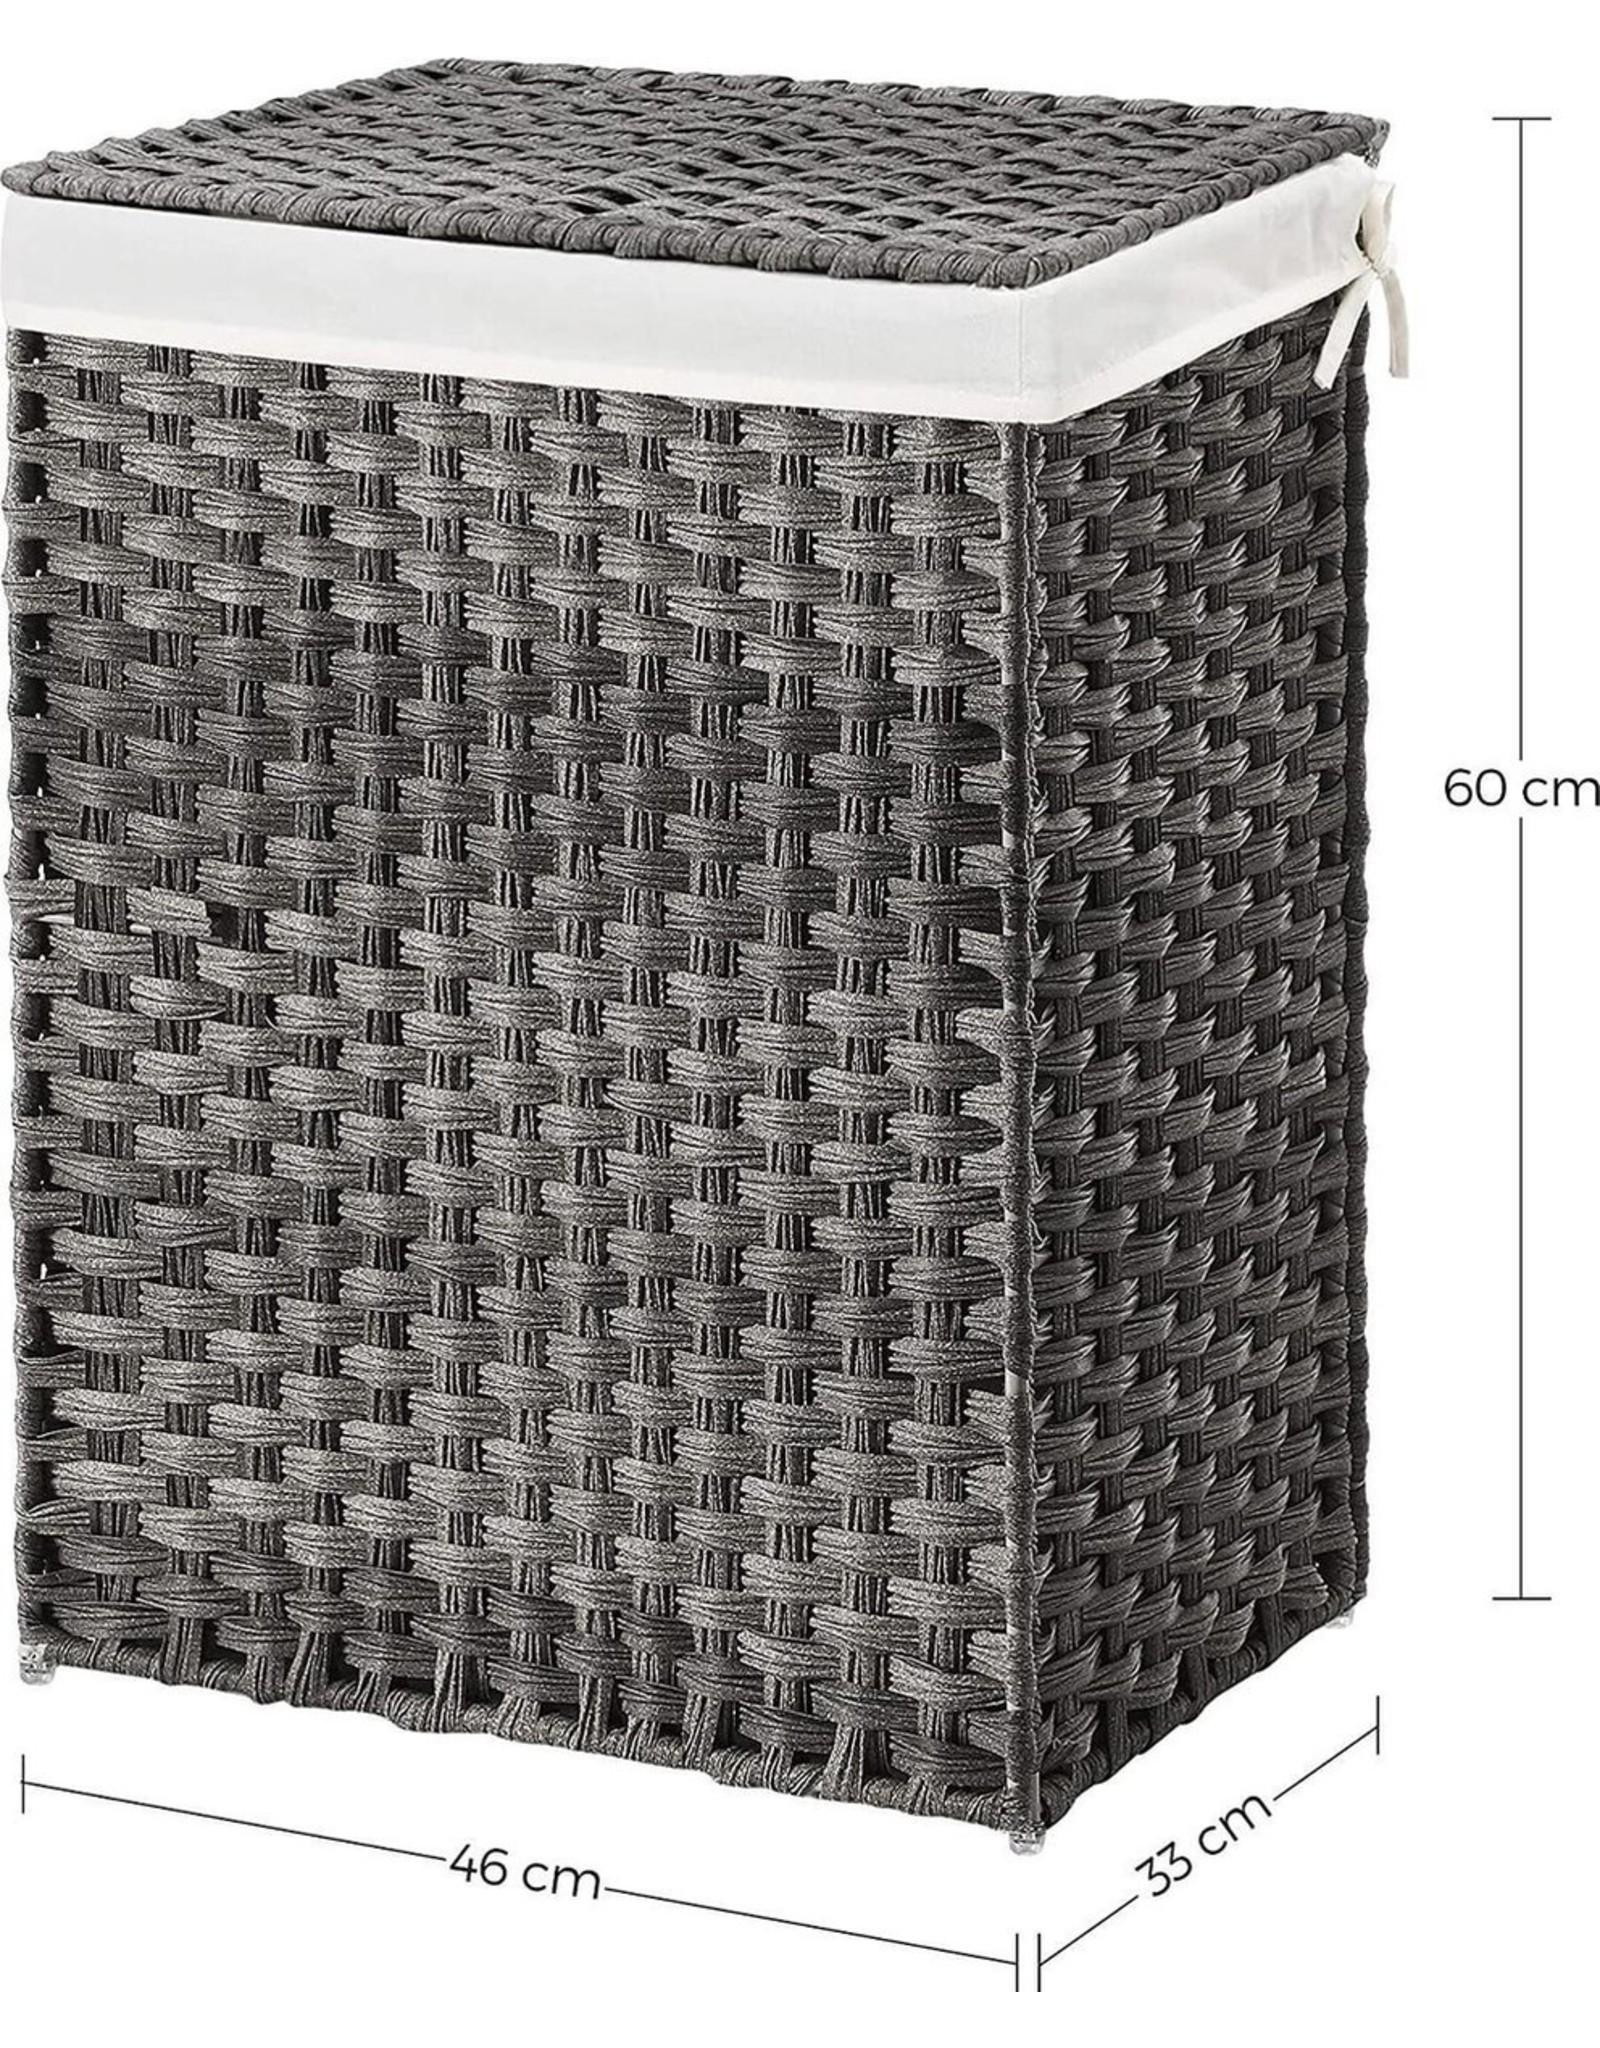 Parya Home Parya Home - Handgeweven Wasmand - 90 Liter - Inclusief Deksel & Handvatten - Grijs